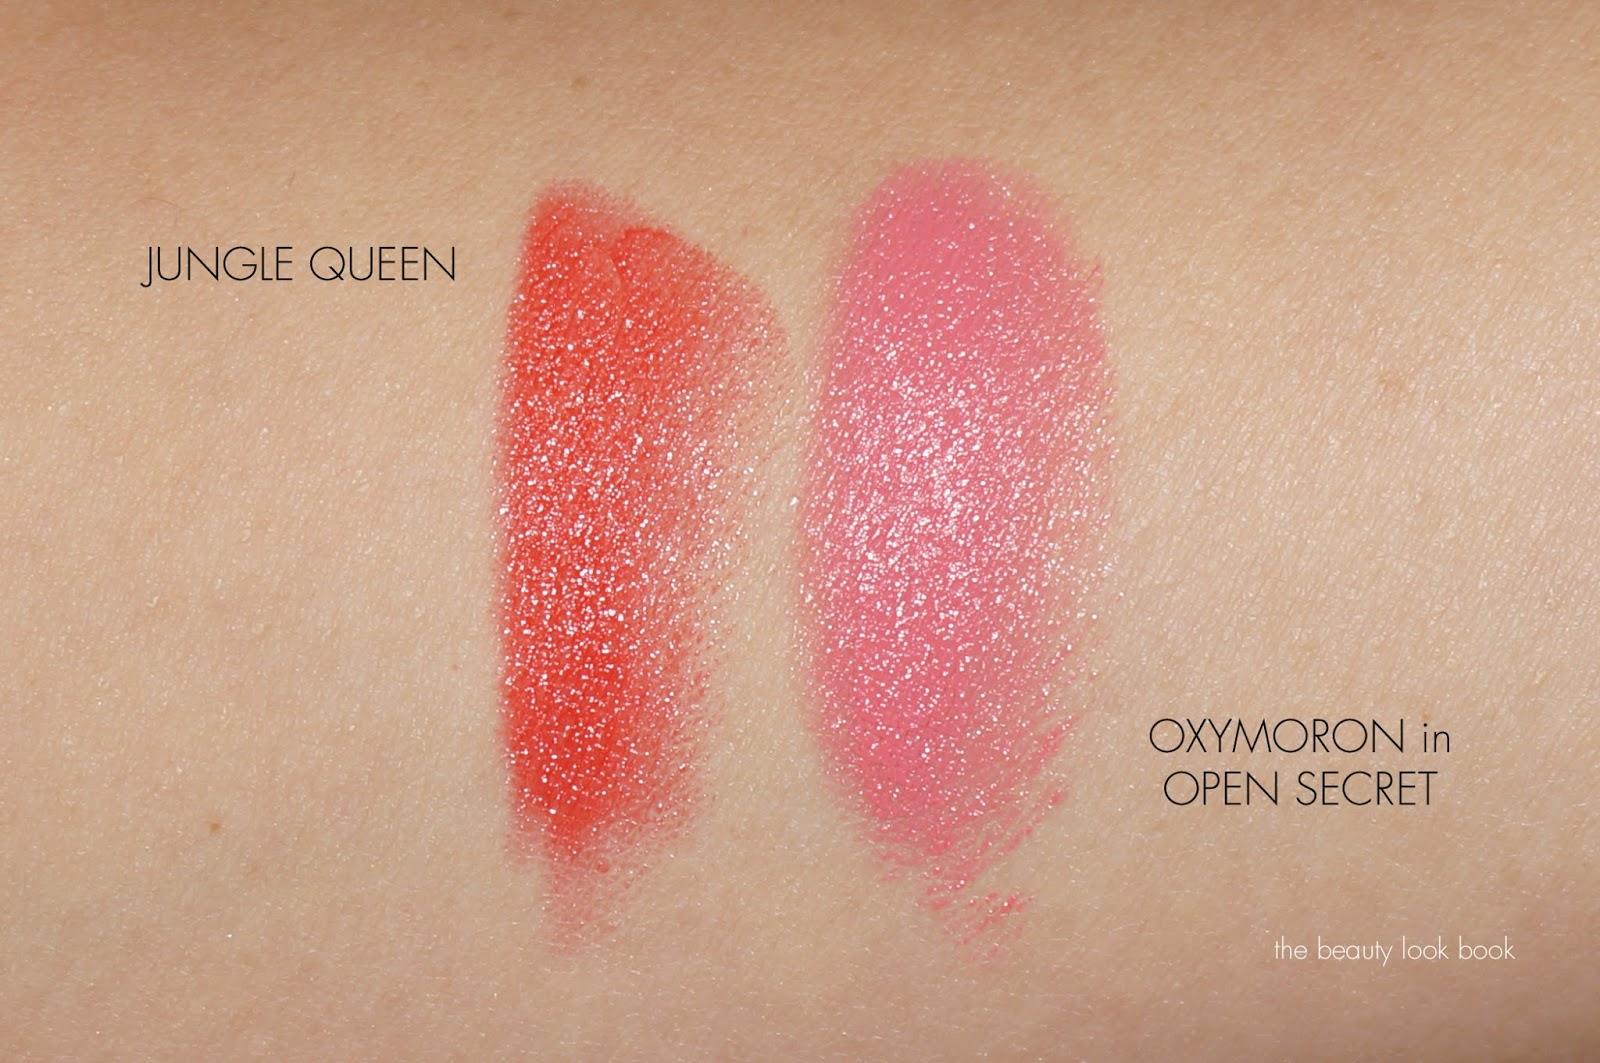 Jungle Queen by Lipstick Queen #3